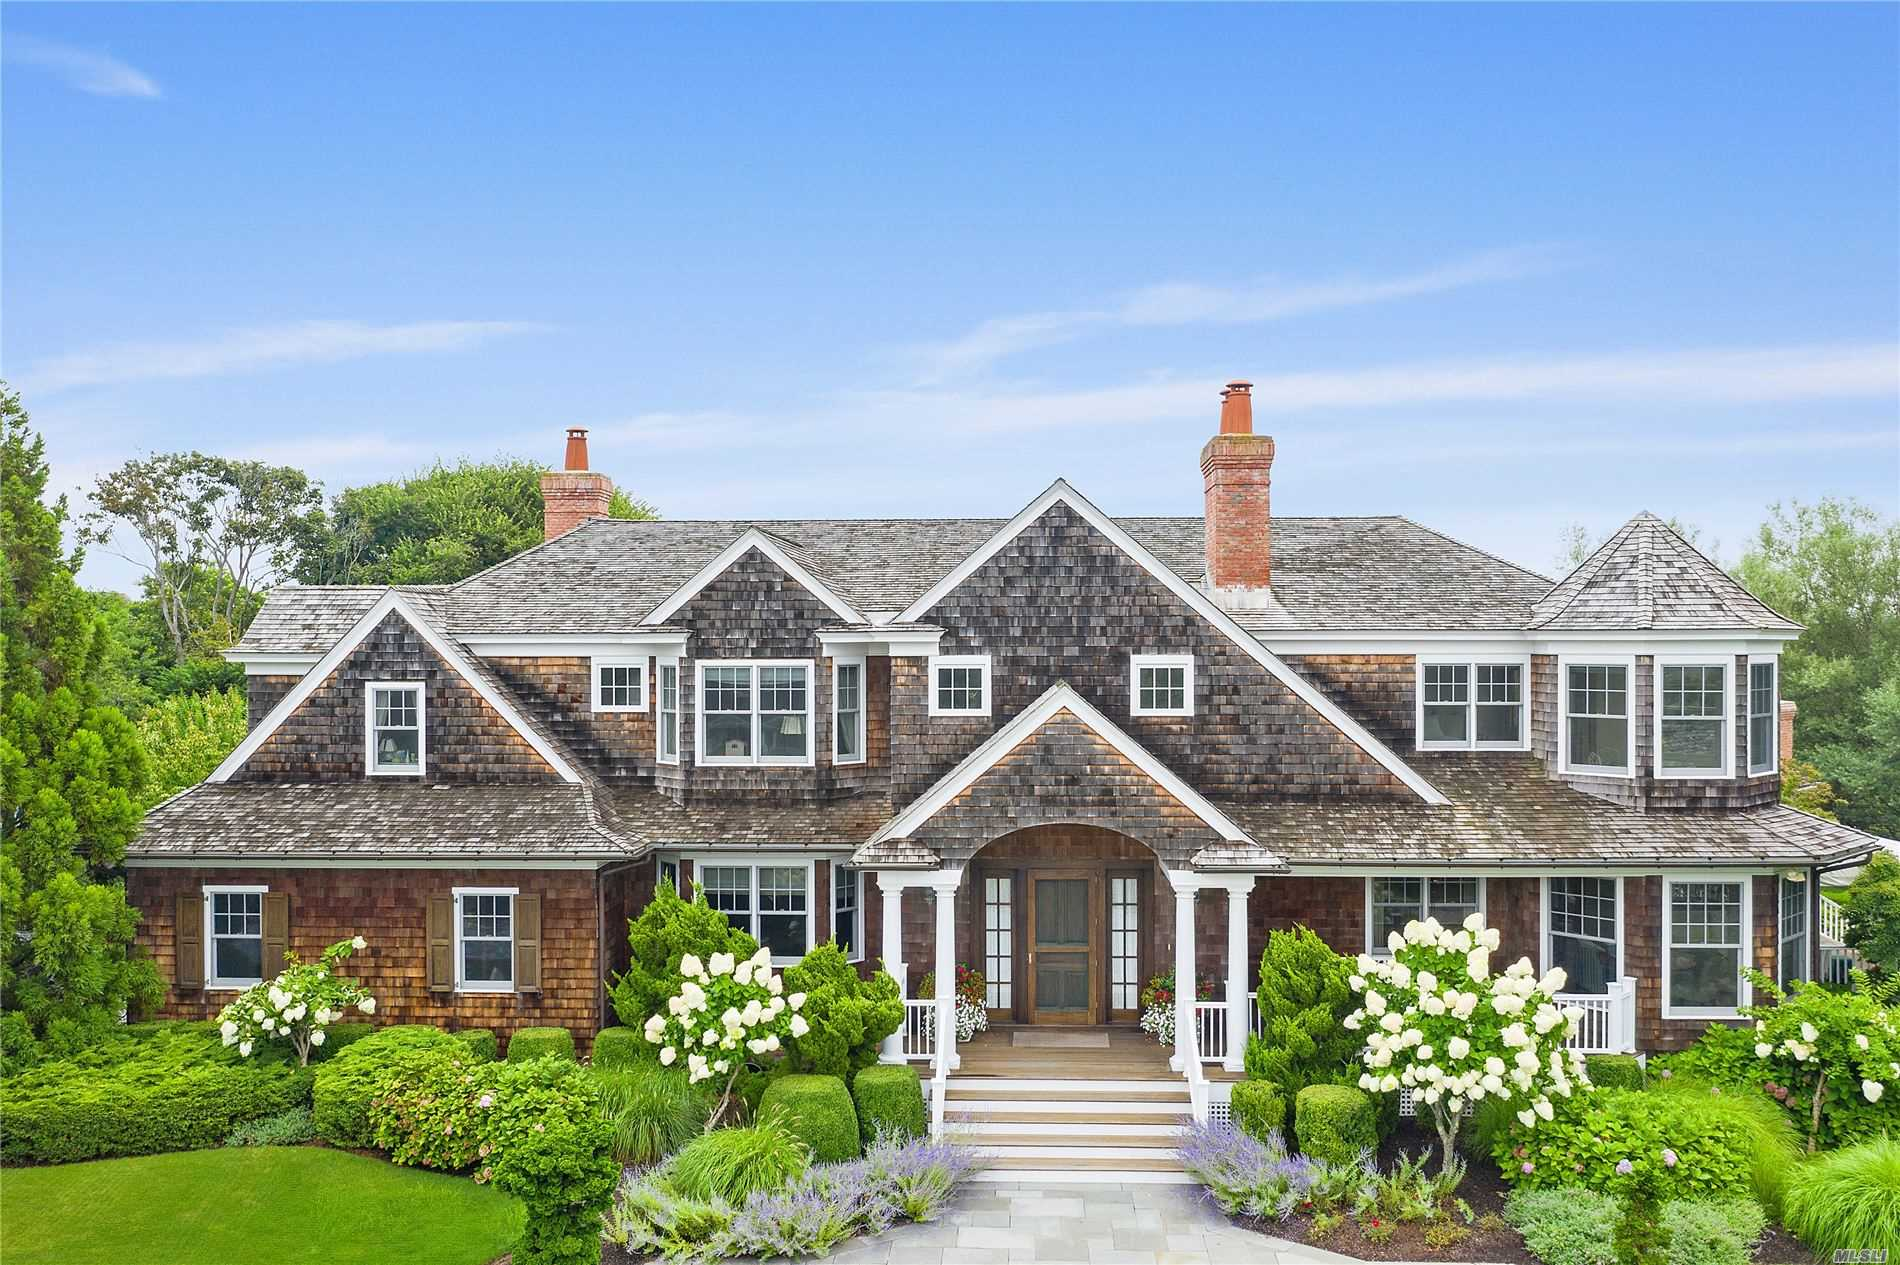 8 Leaward Lane, Quogue, New York 11959, 6 Bedrooms Bedrooms, ,5 BathroomsBathrooms,Residential,For Sale,Leaward,3157087